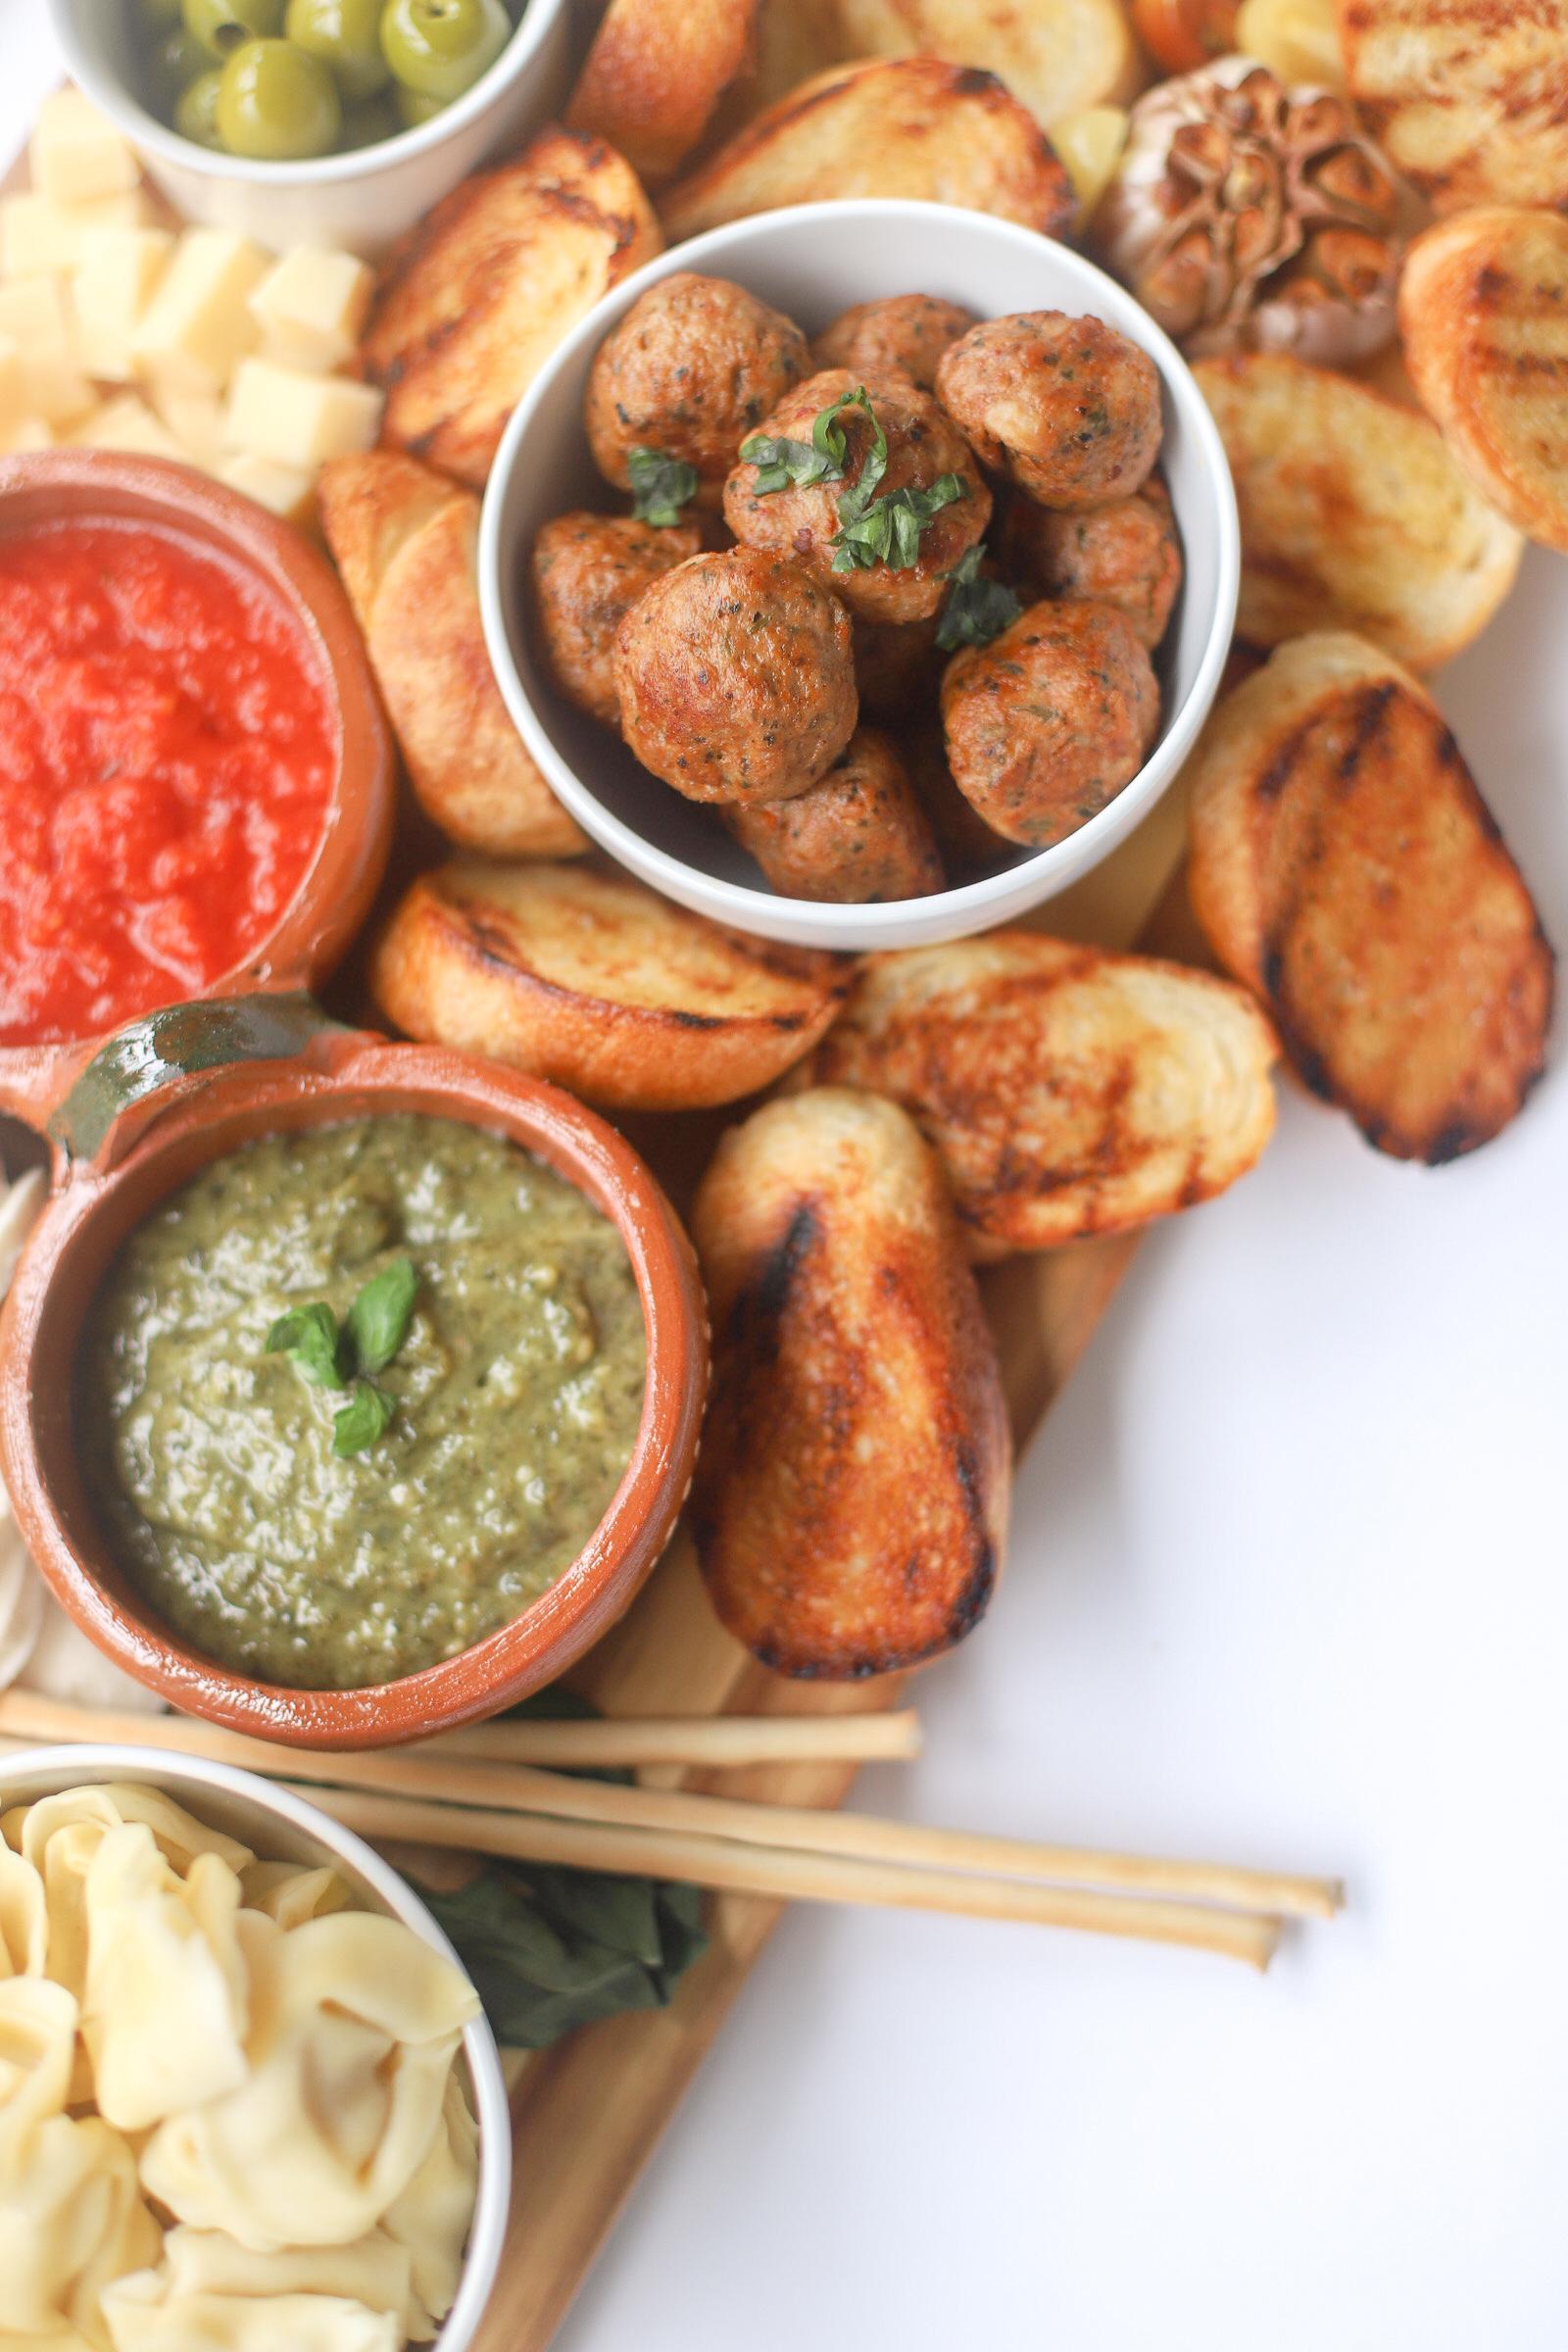 Italian Family Dinner Charcuterie Board